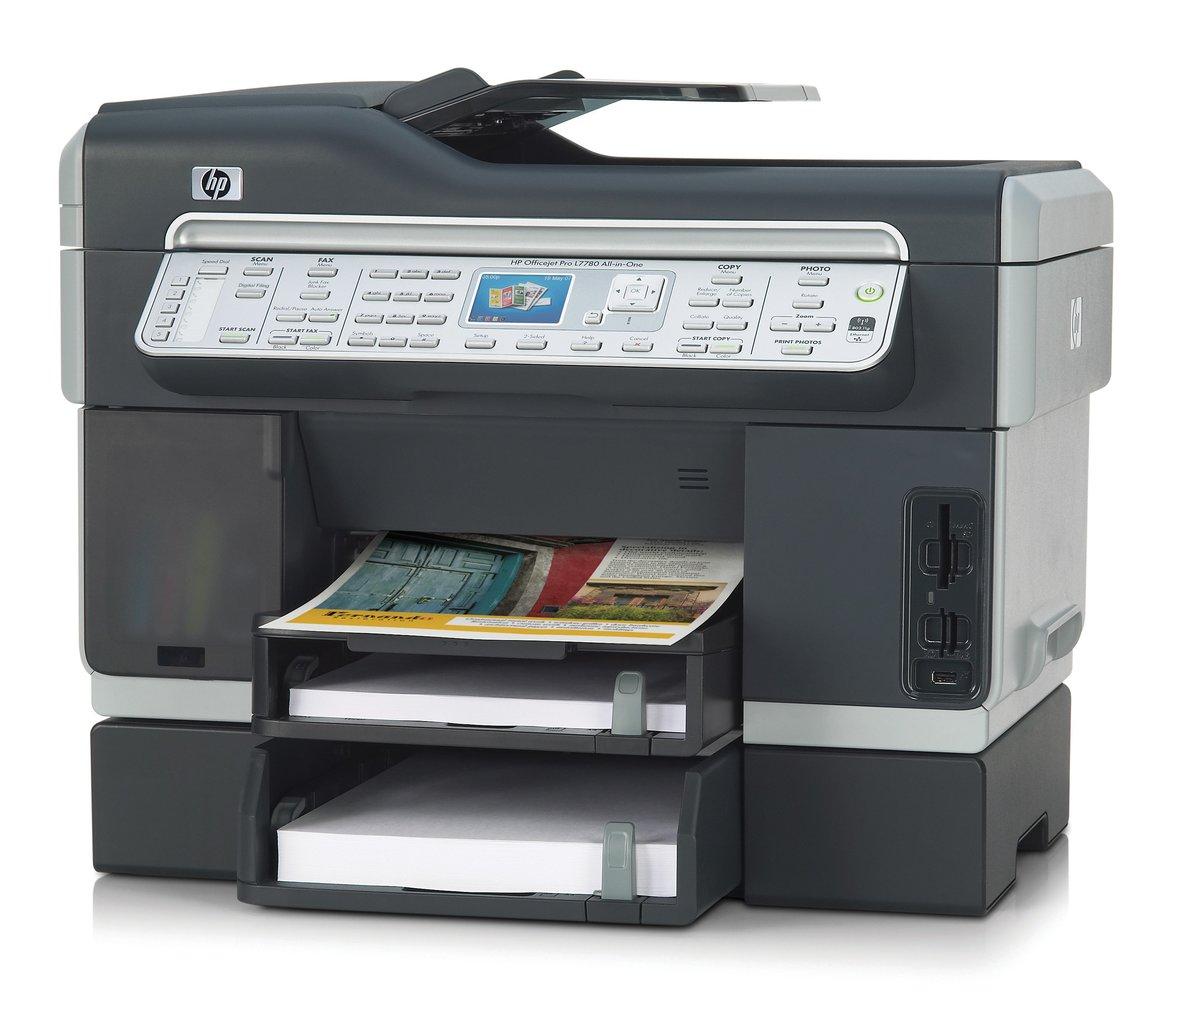 HP Officejet Pro L7780 All-in-One Color Inkjet Printer - 4800 dpi, 35 ppm,  Wi-Fi, USB, 192 MHz at TigerDirect.com